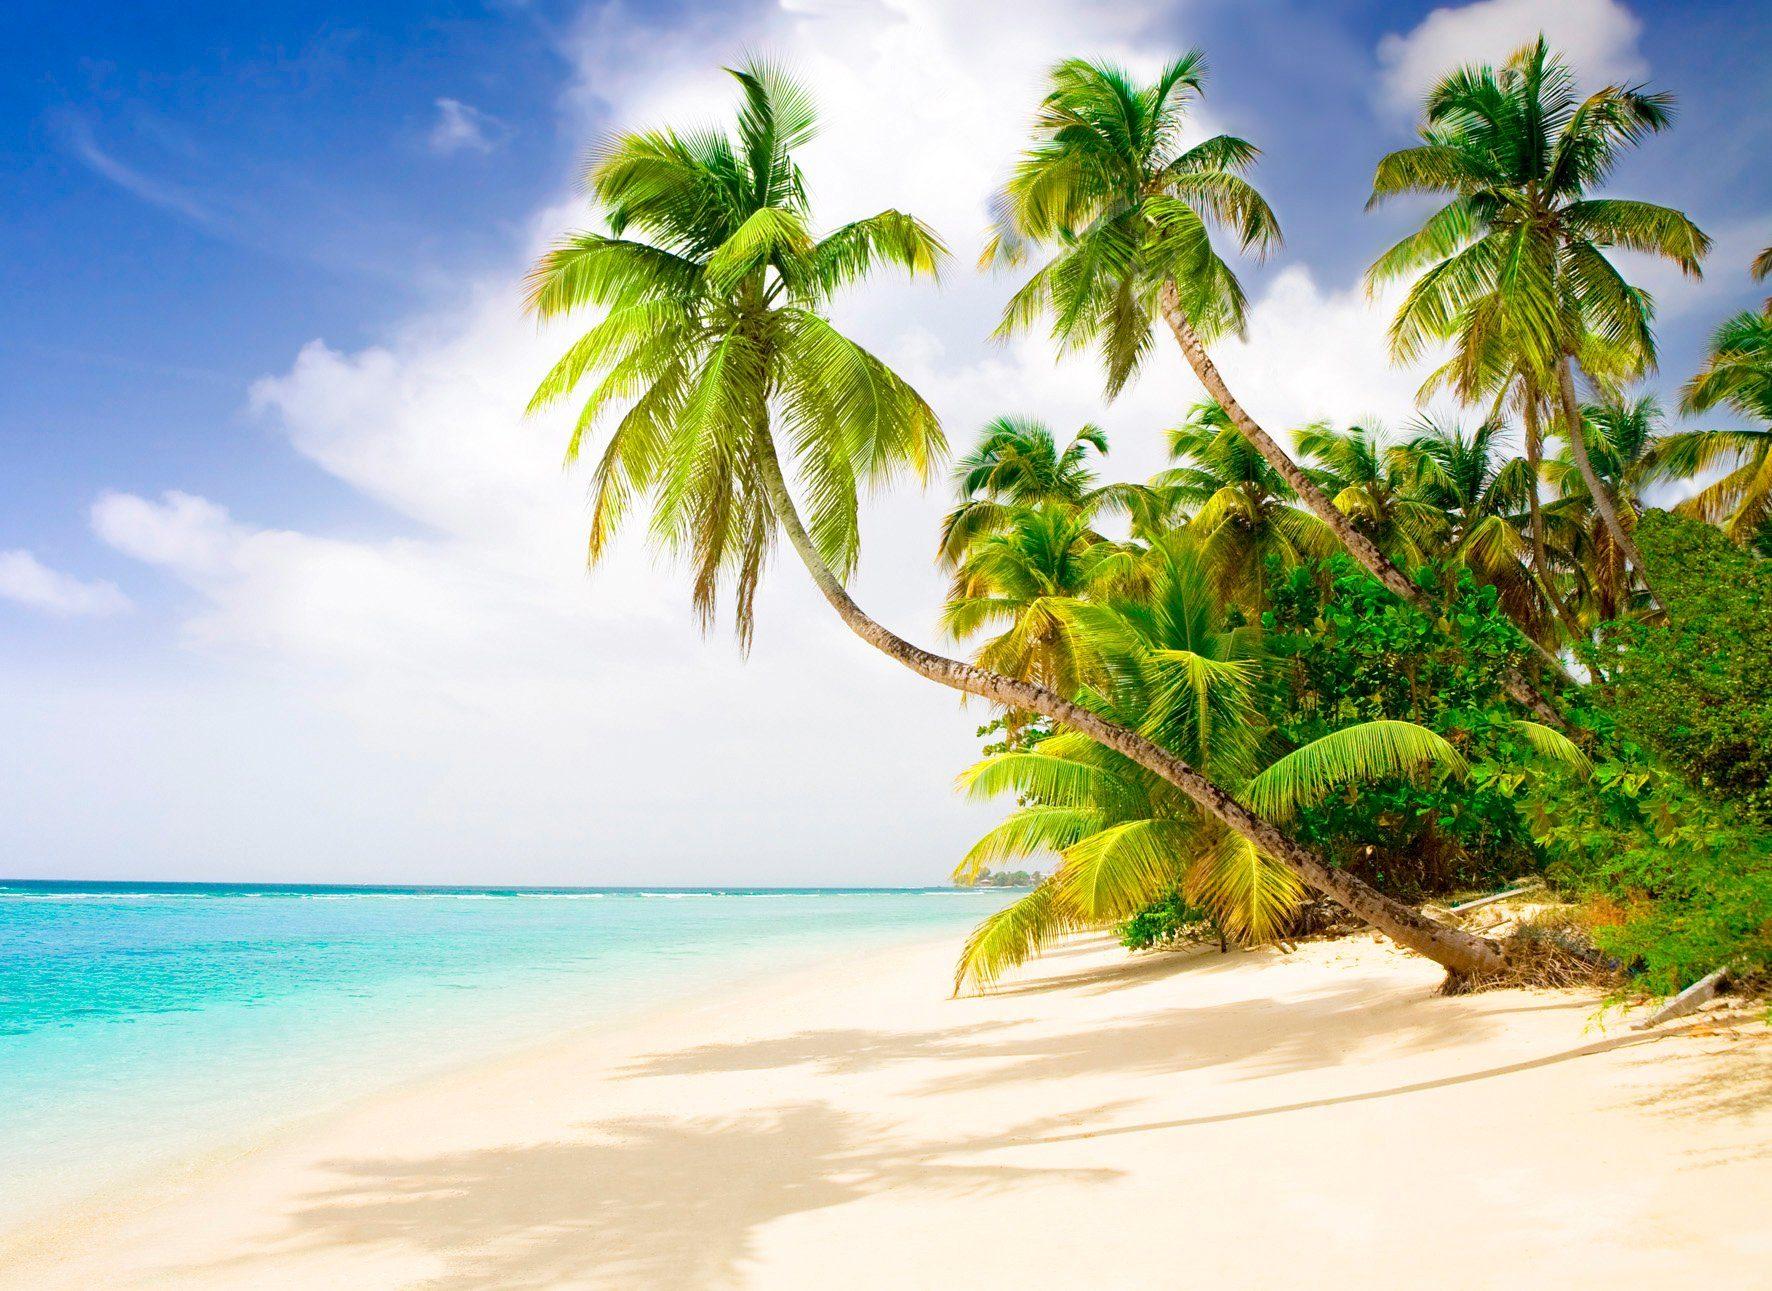 PAPERMOON Fototapete »Beach in the South Seas«, Vlies, 7 Bahnen, 350 x 260 cm